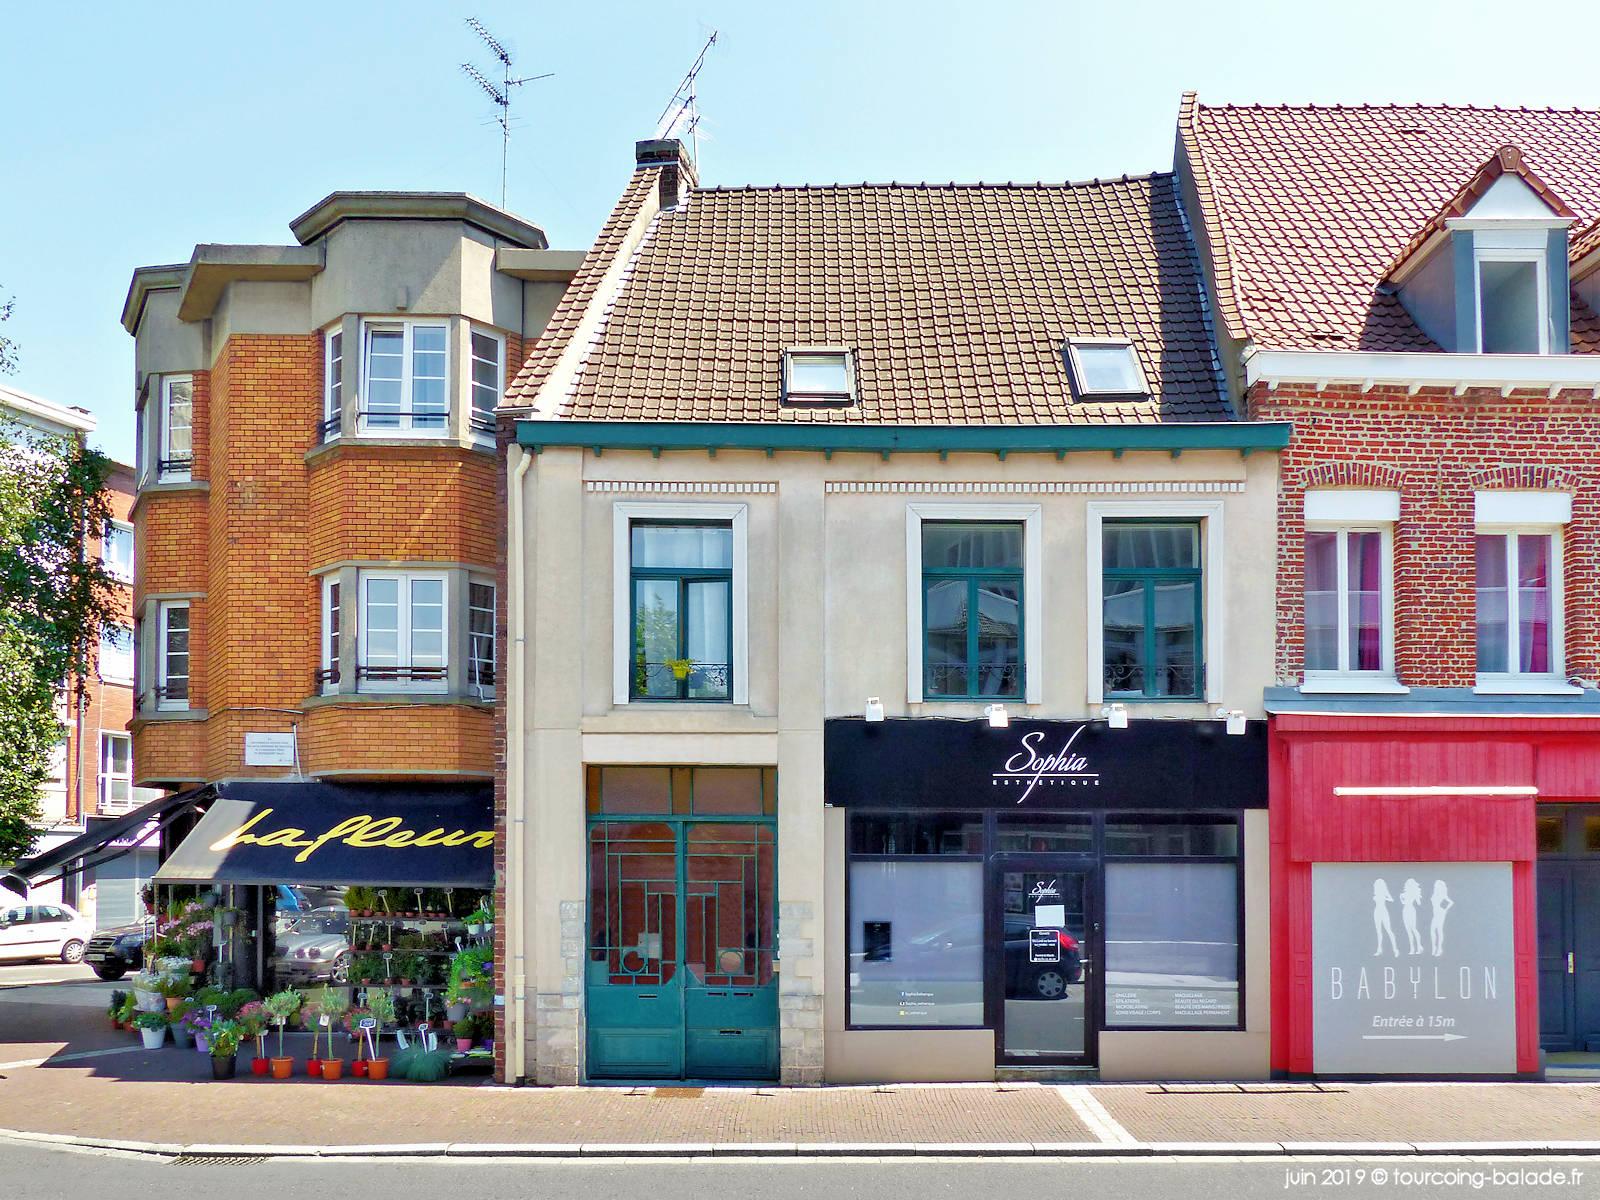 Sophia Esthétique - Rue de Tournai, Tourcoing